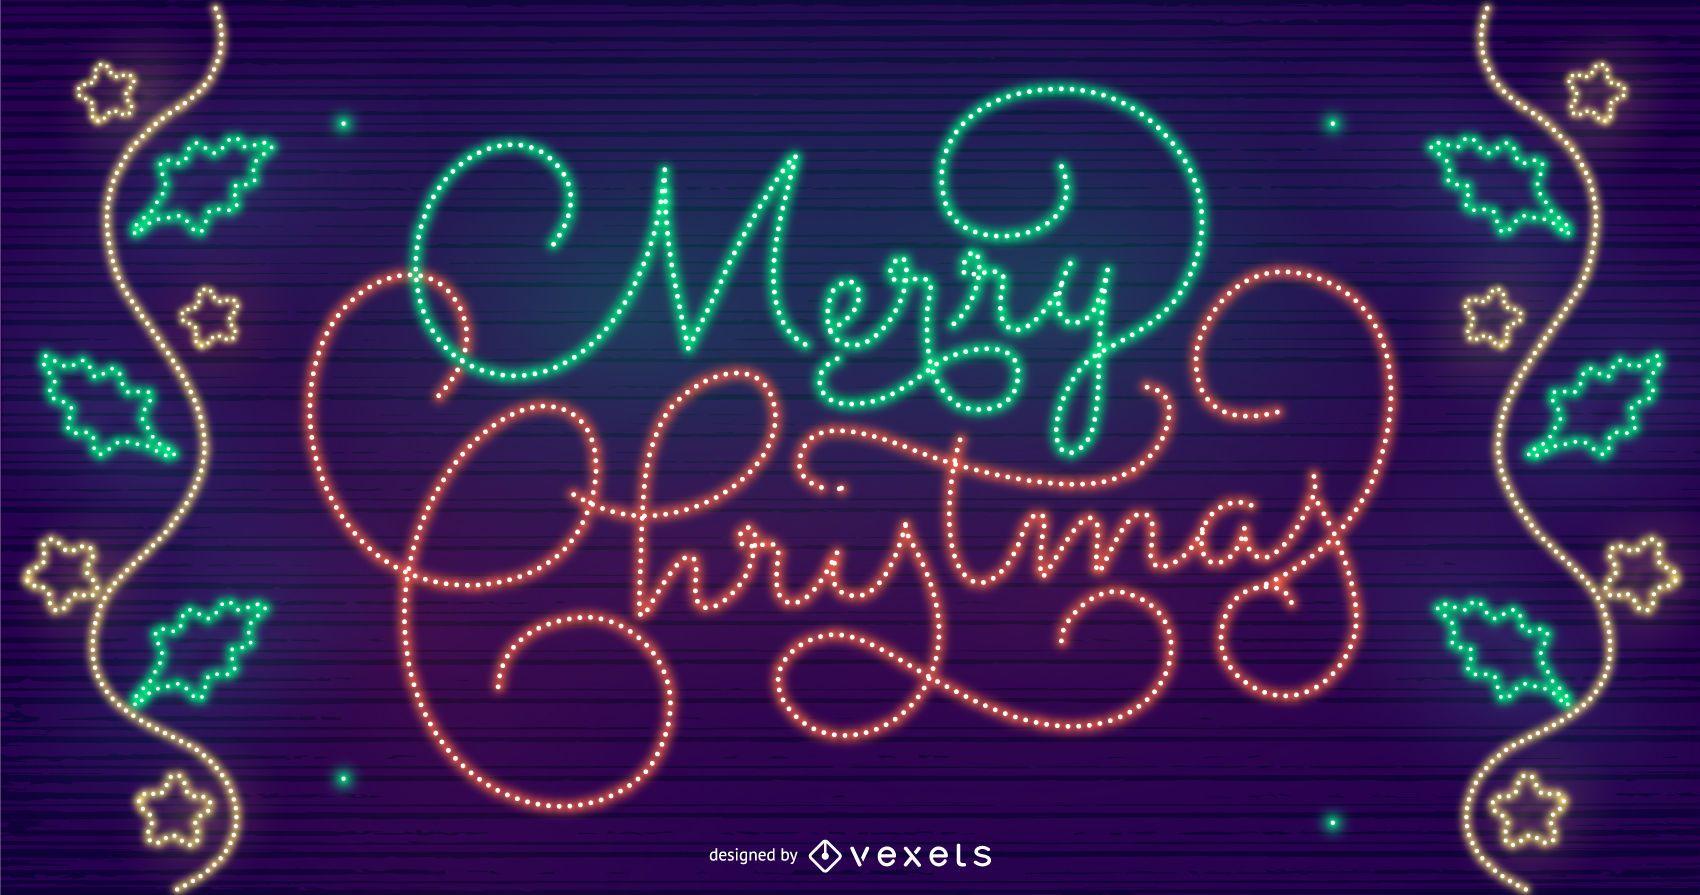 Merry christmas lights background design